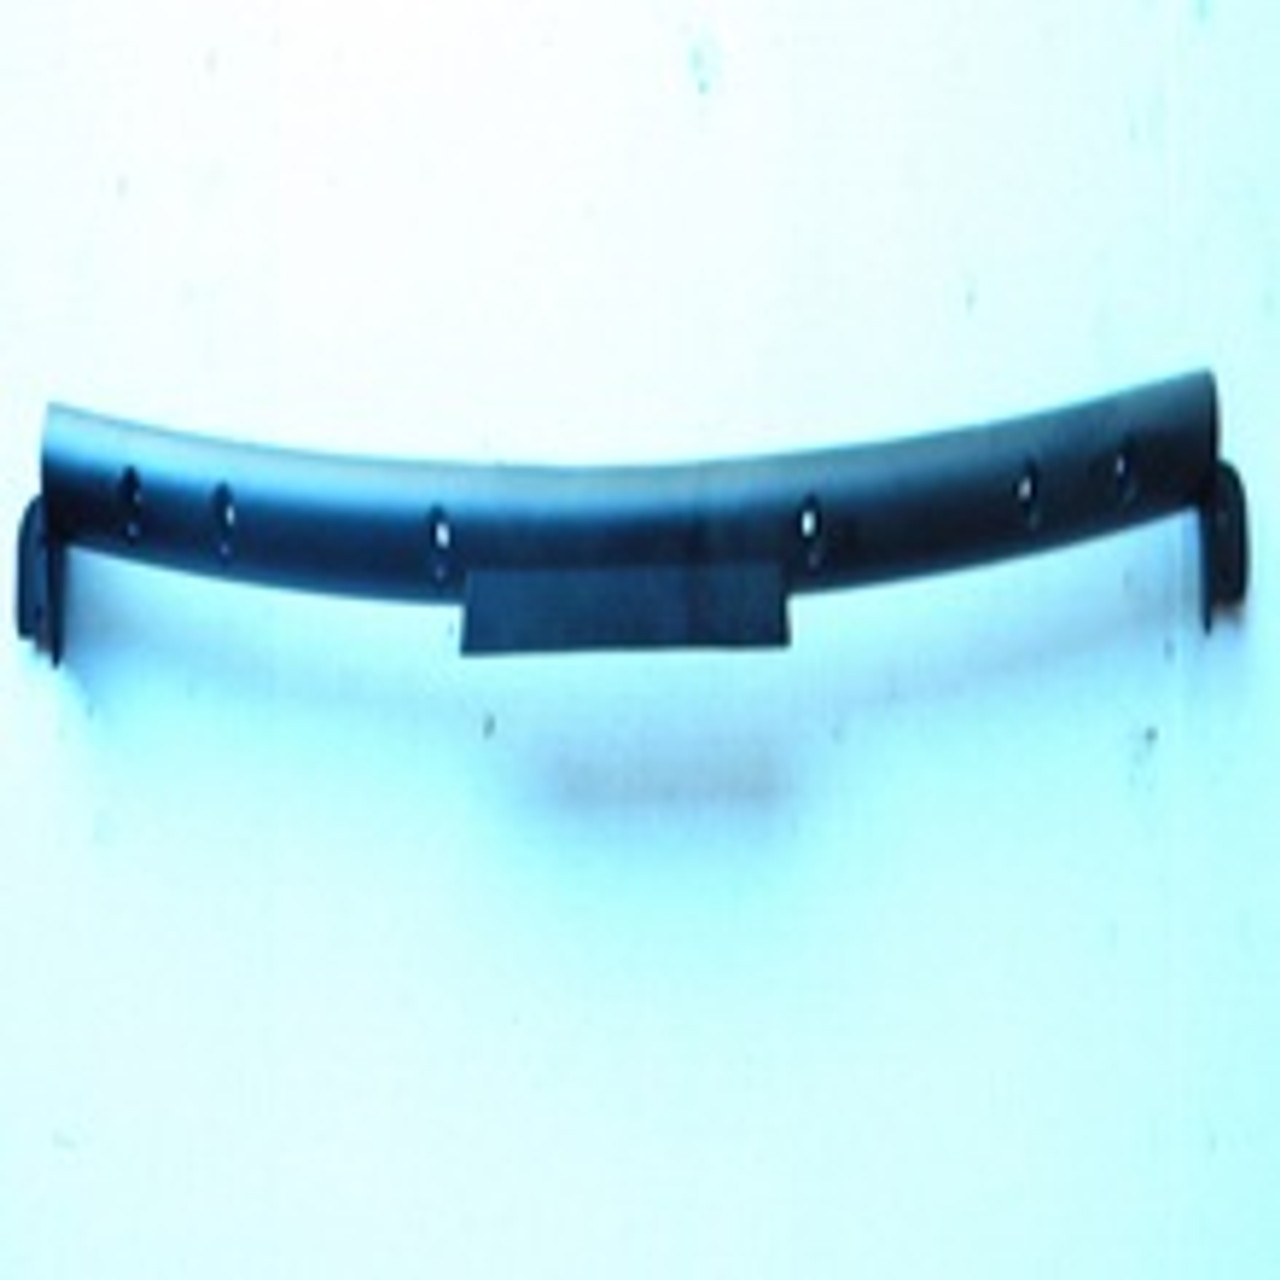 Sears Nordic Track Treadmill Model 298331 T 5.5 Pulse Bar Part 283678